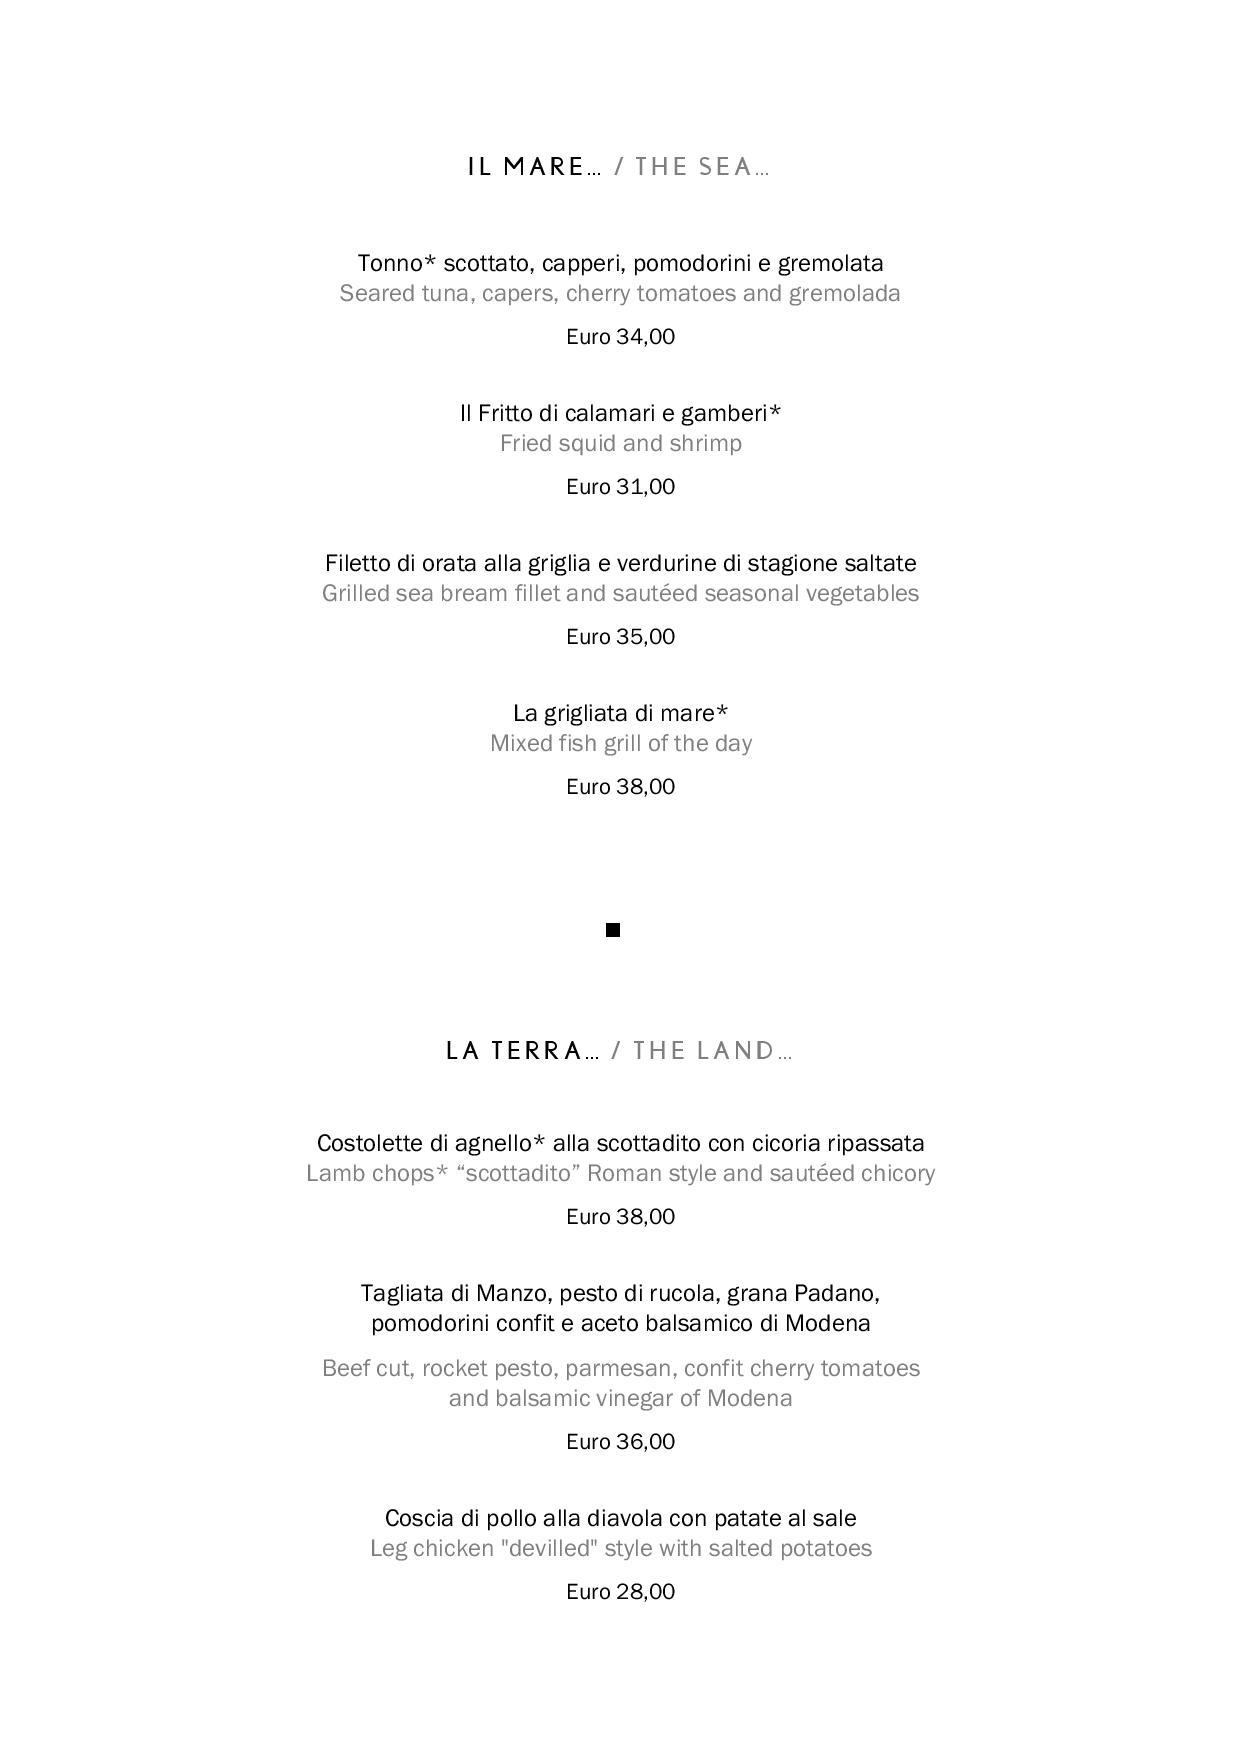 Uliveto food page 004 1 - REVIEW - Rome Cavalieri a Waldorf Astoria Hotel : Premium Rome View Room [COVID-era]